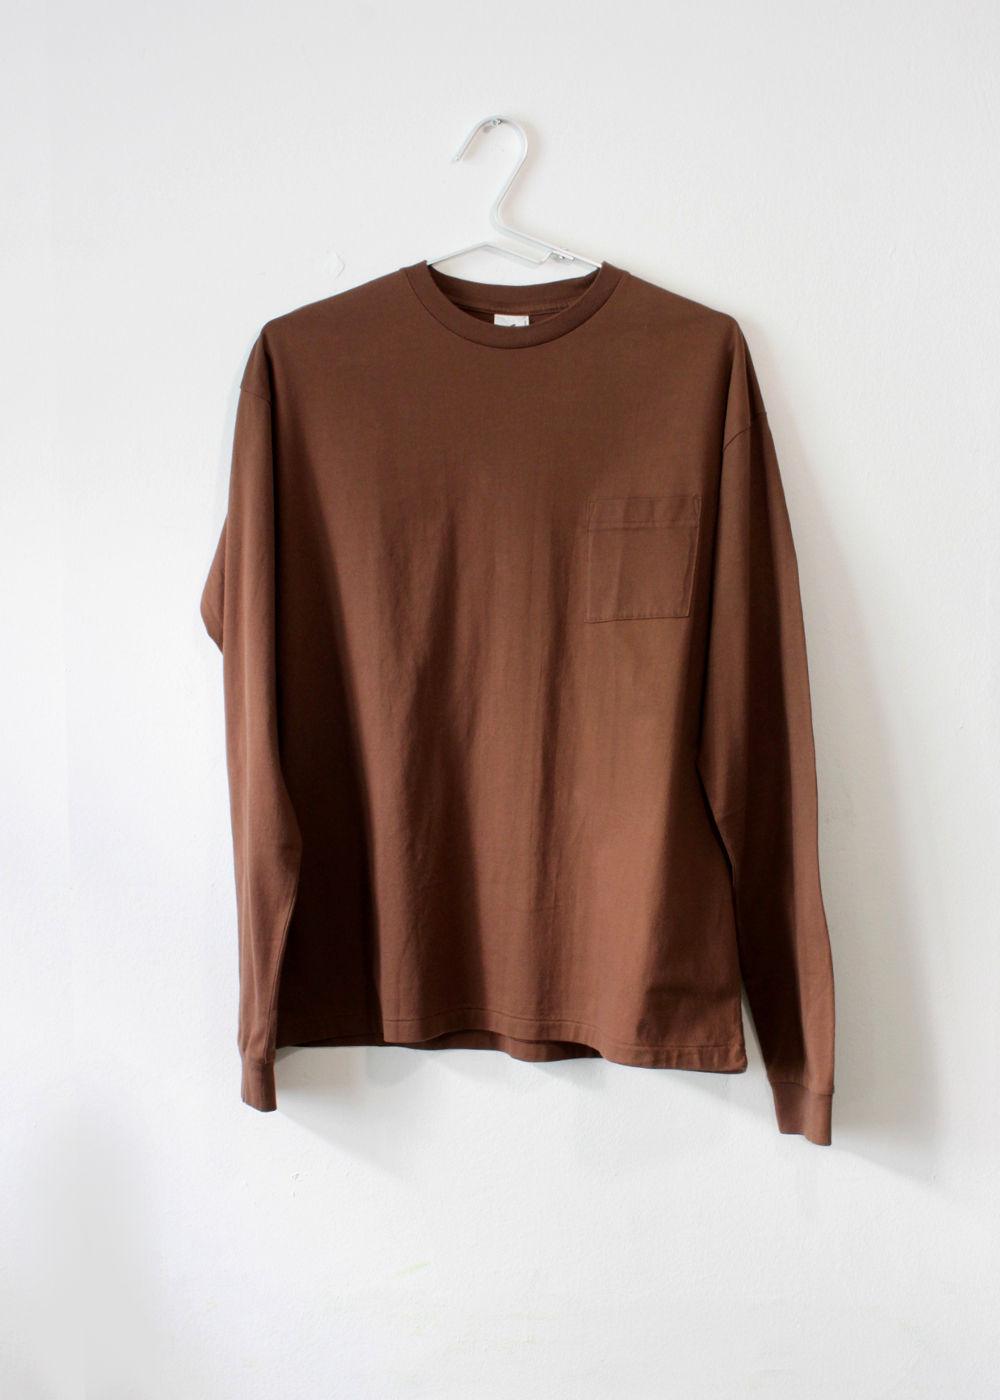 CTheHadagi-Crew-Neck-Long-Sleeve-T-shirts-Brown